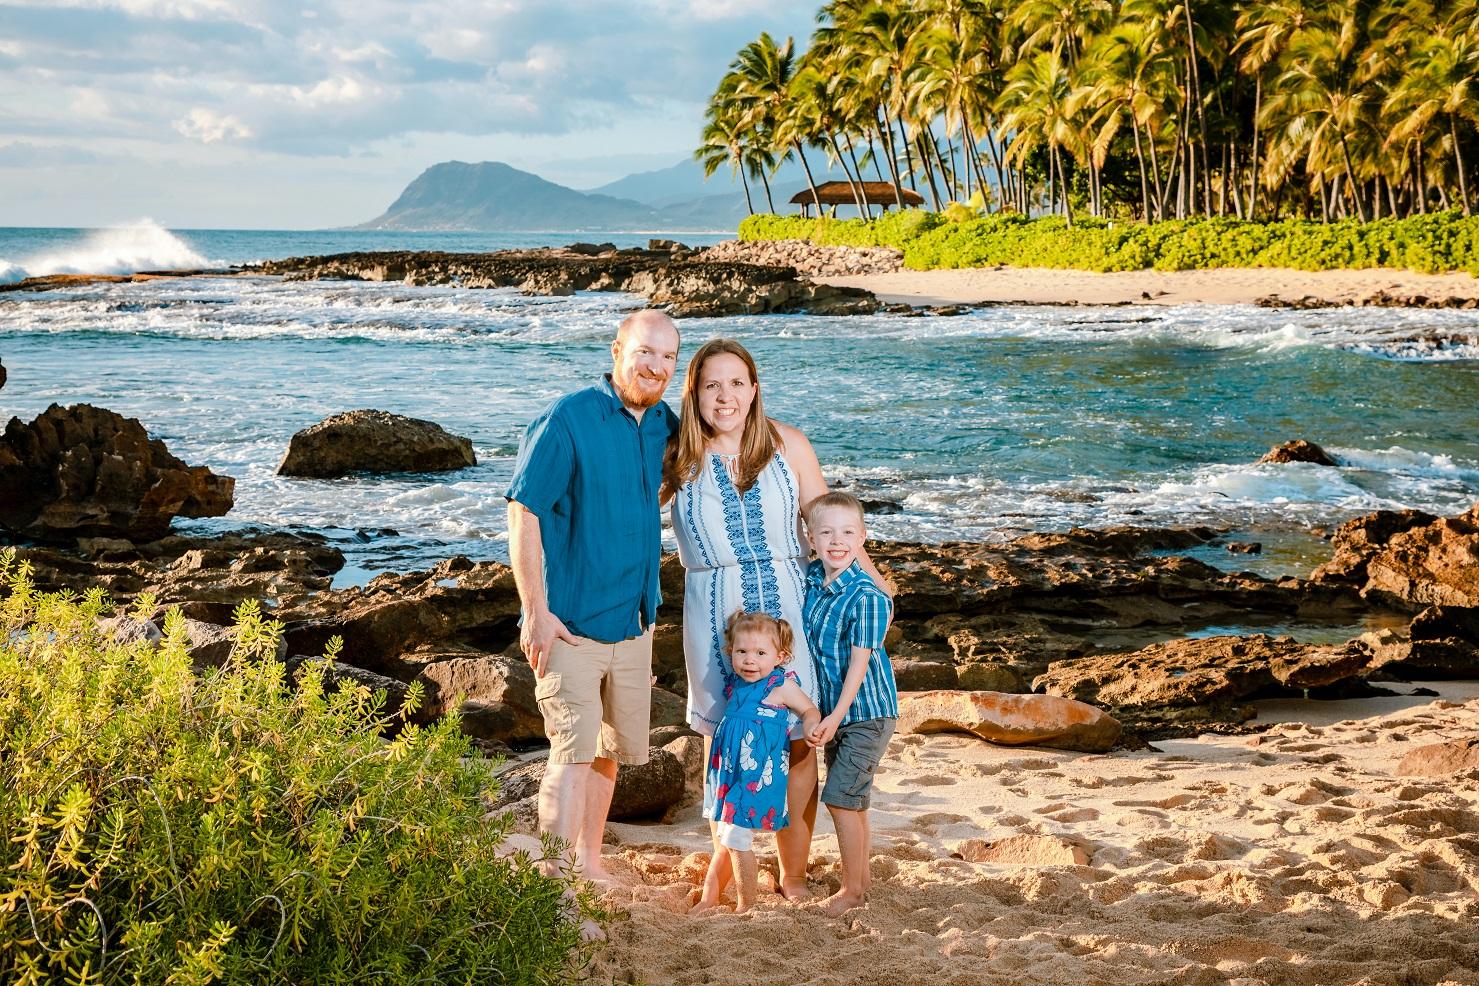 Oahu2018-48459.jpg